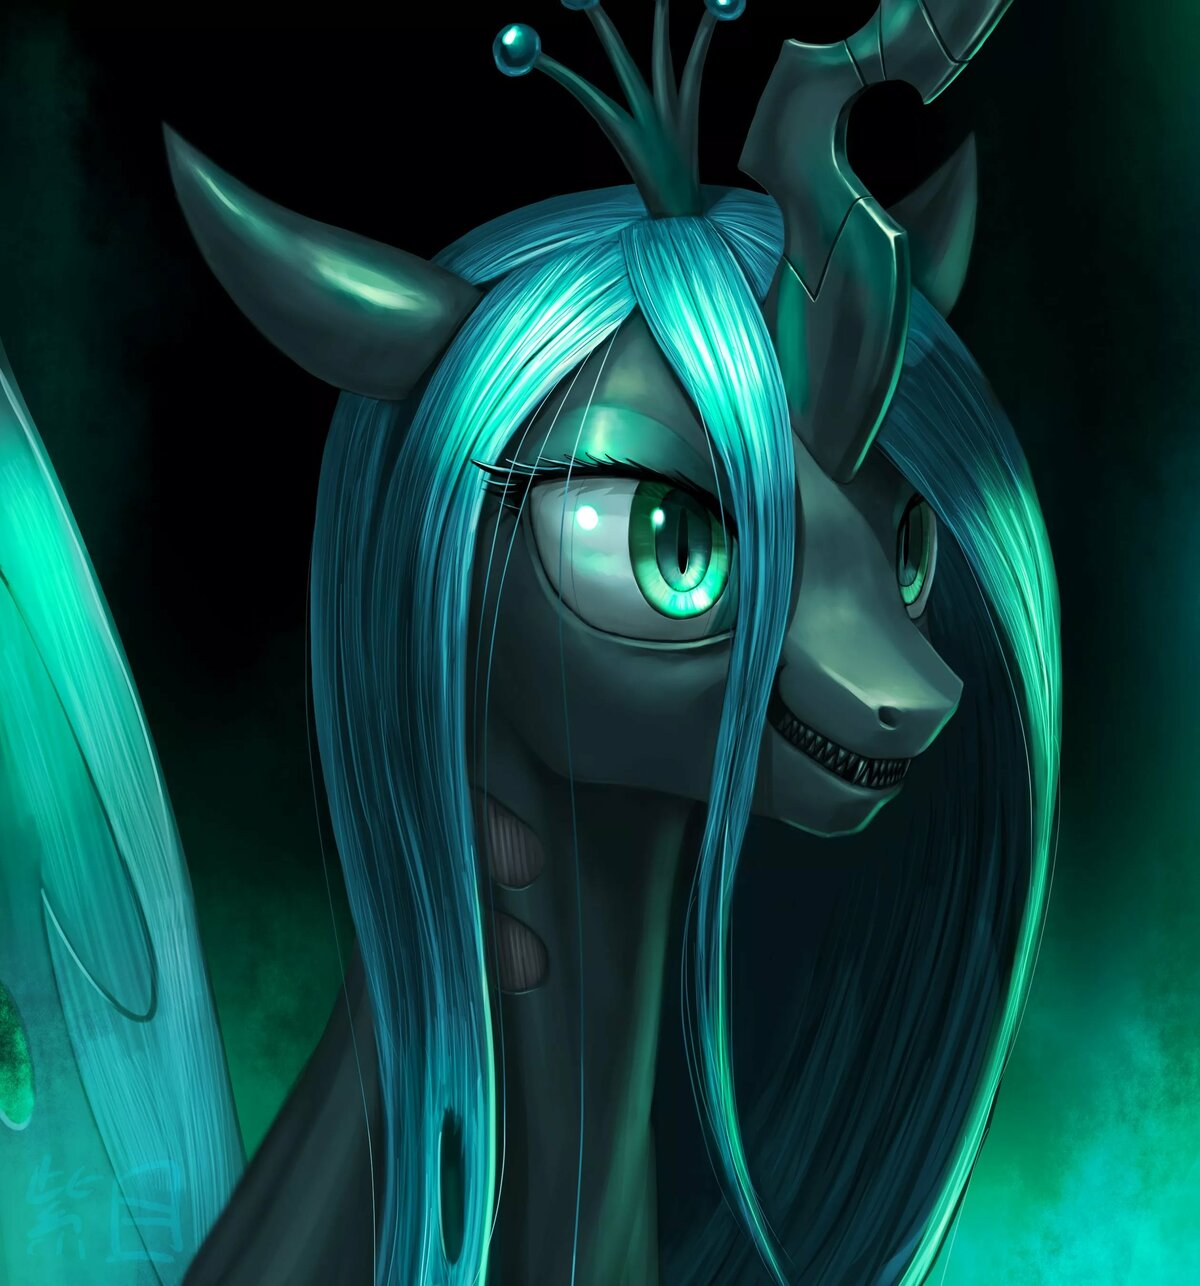 картинки пони королева крисалис как покоряющий